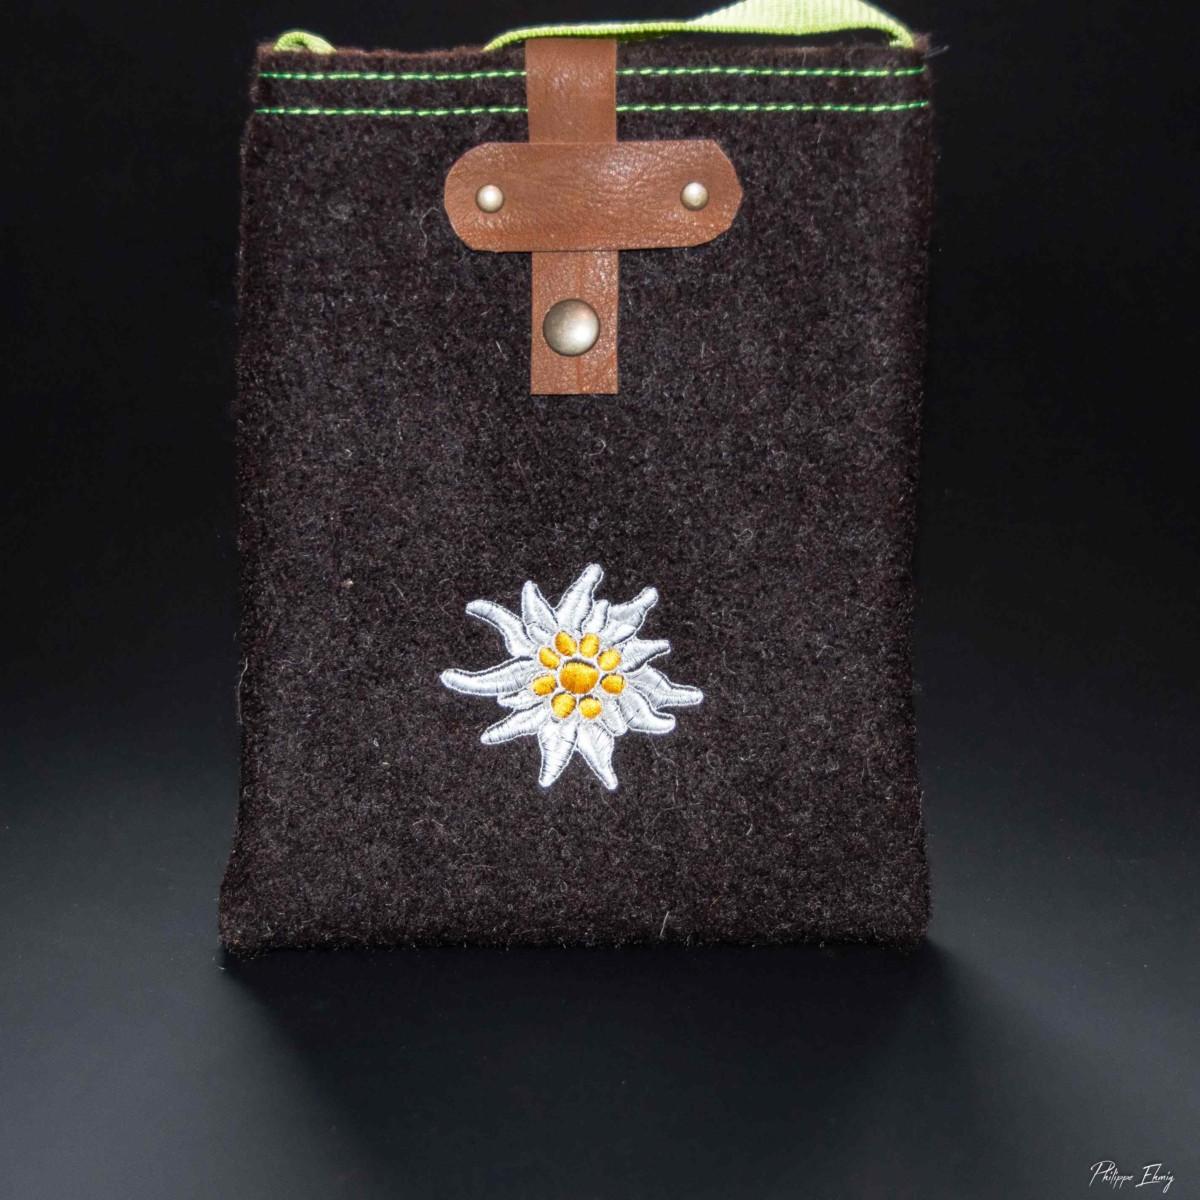 pochette edelweiss marron, accessoire mode homme femme